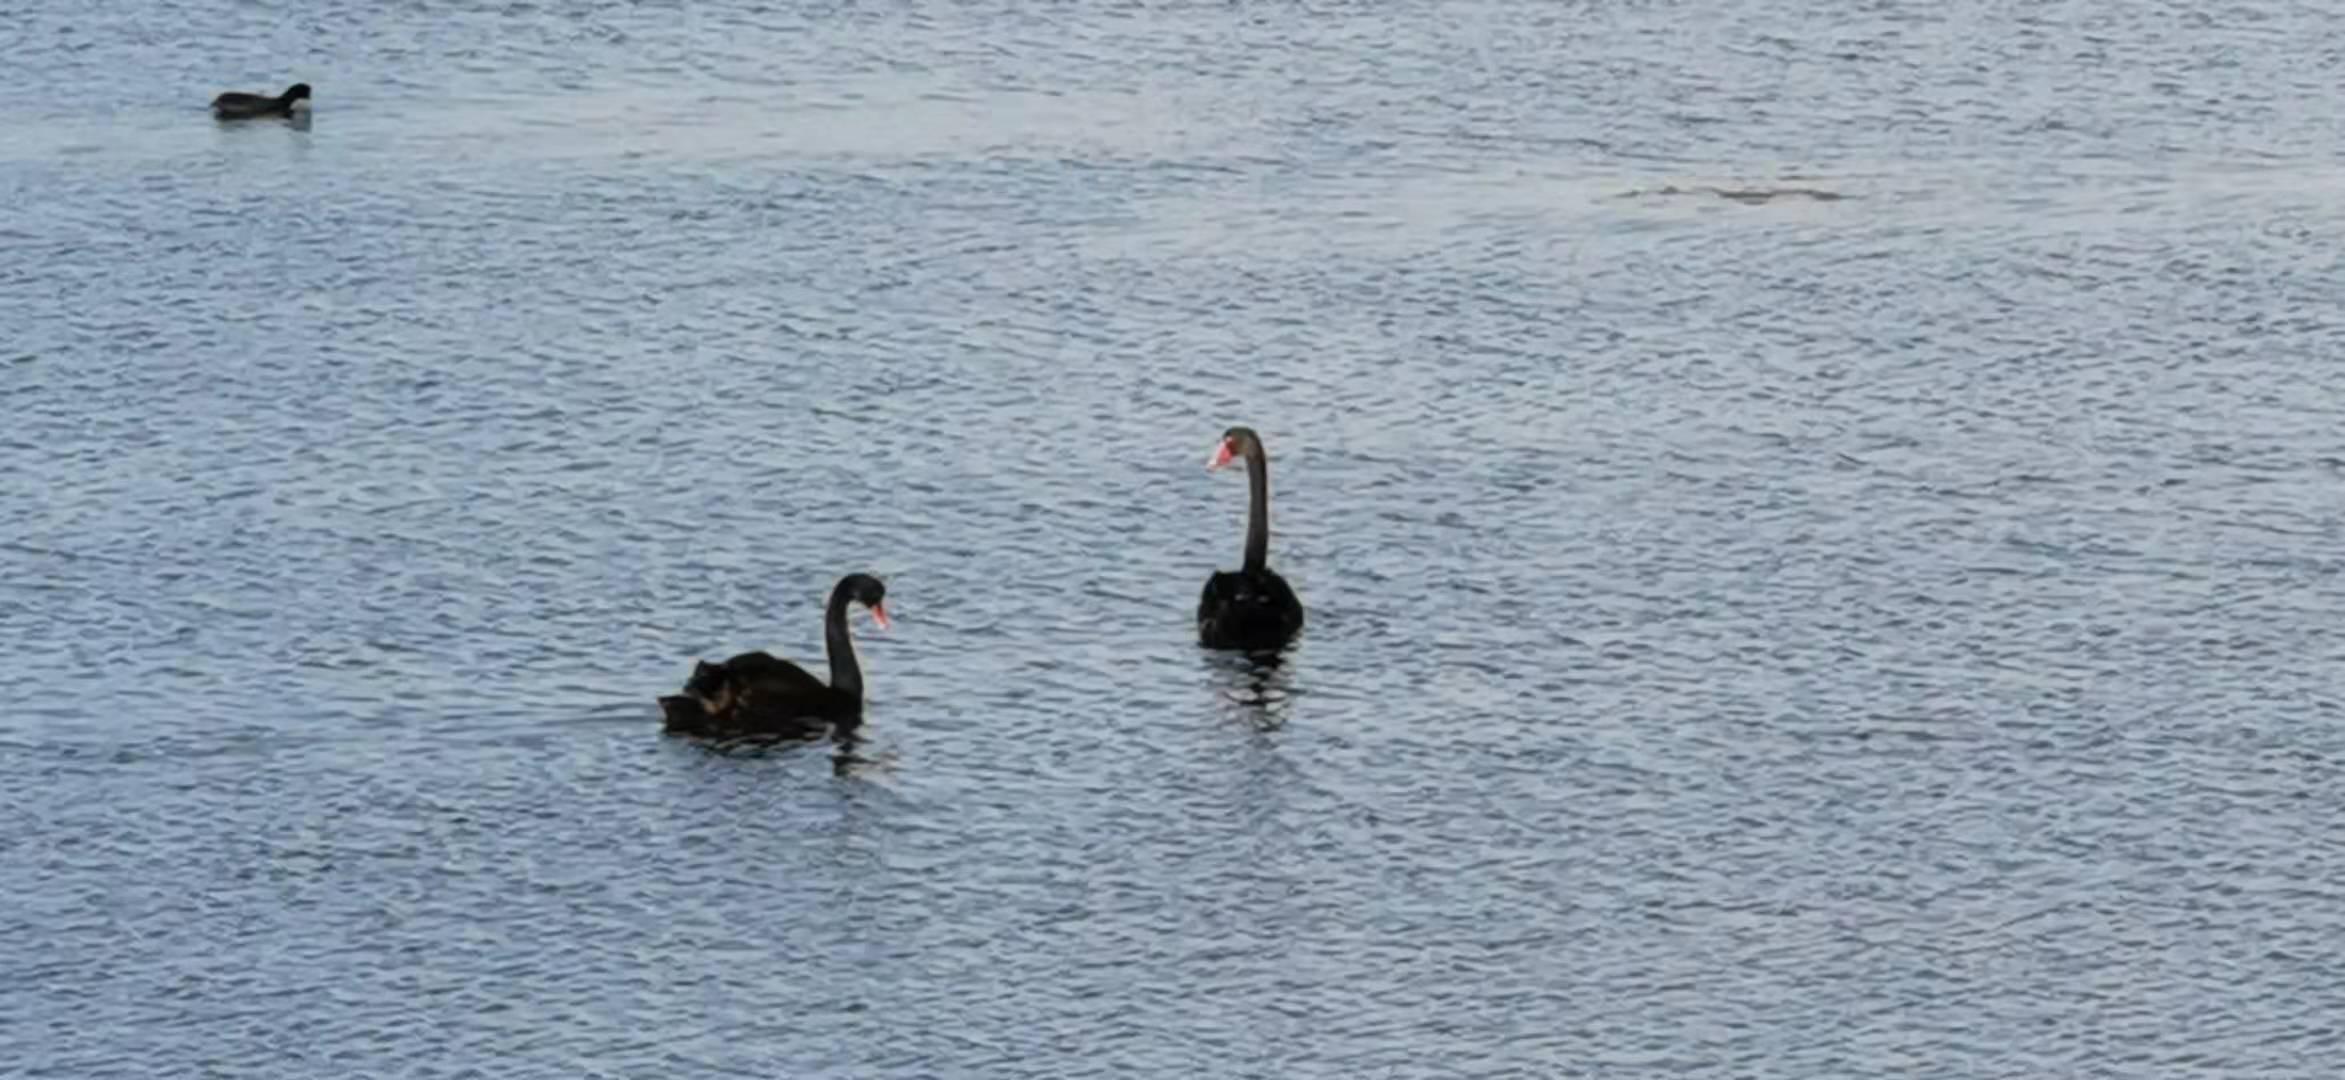 Black swan at the lake